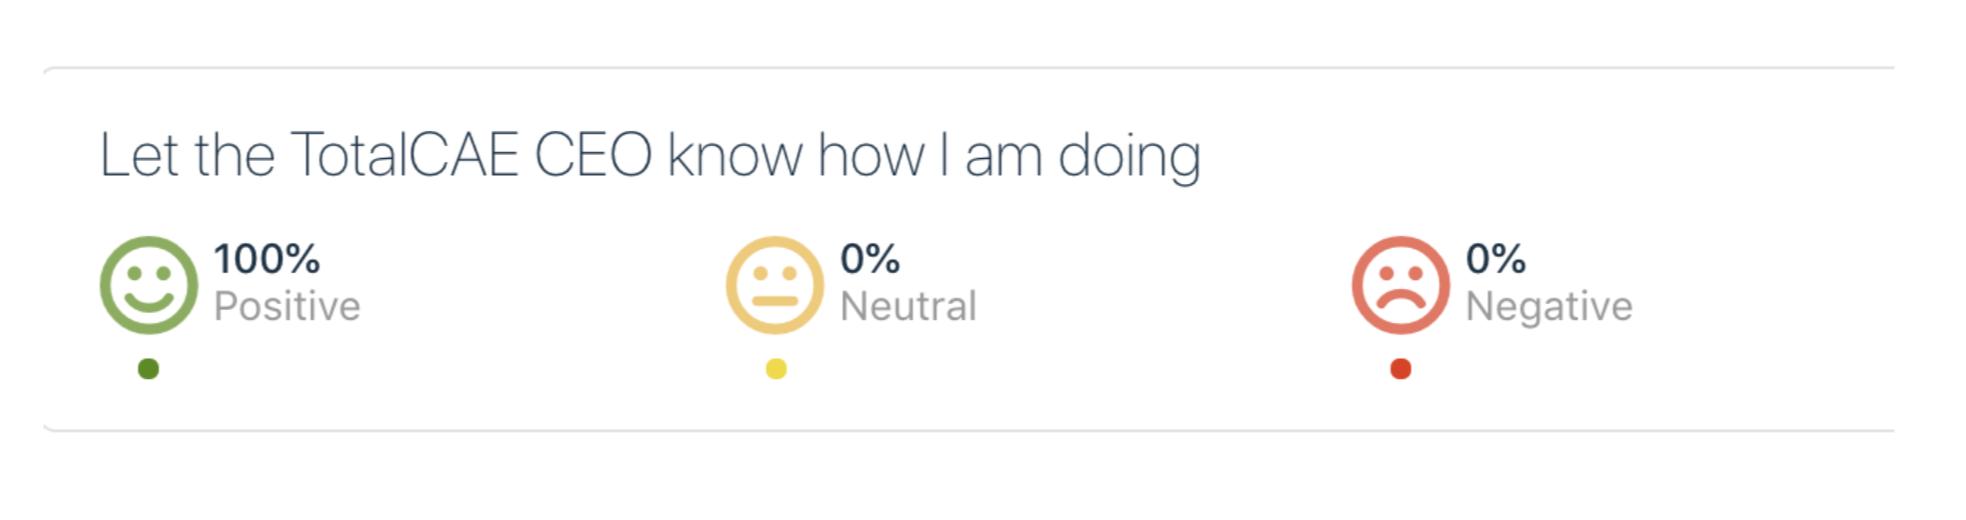 TotalCAE Client Satisfaction